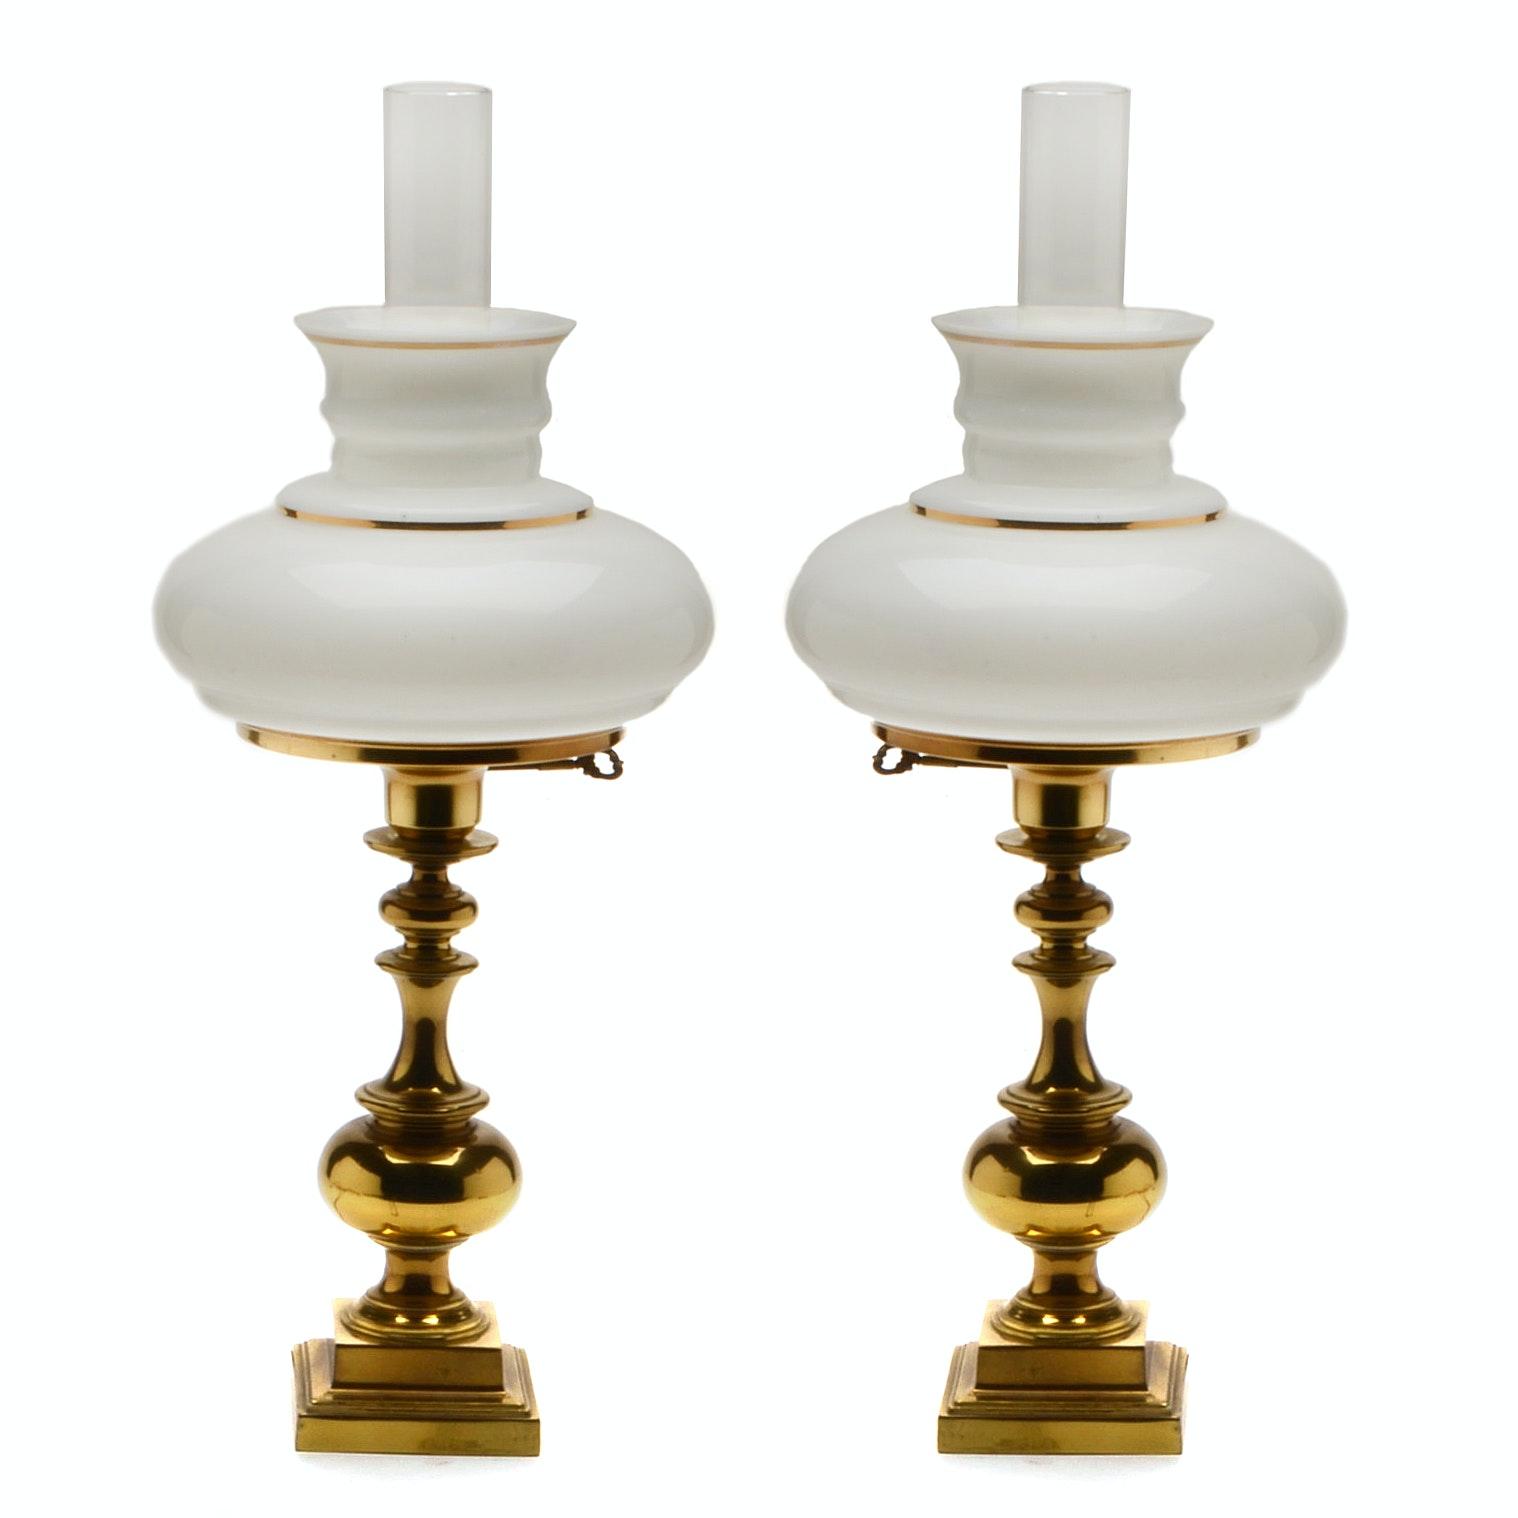 Brass Tone Hurricane Lamps